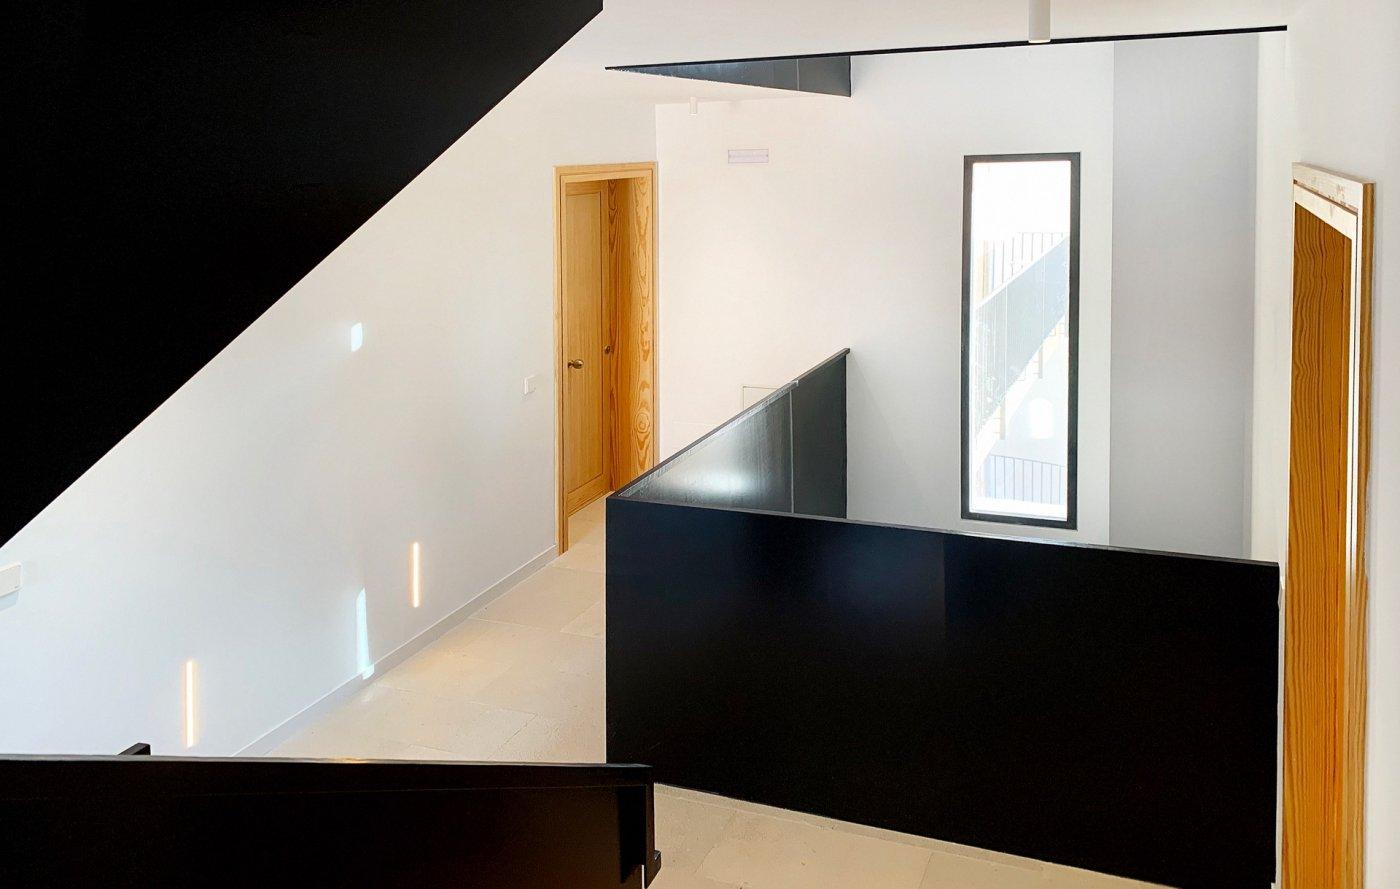 A estrenar espectacular 1er piso con ascensor en alaró. - imagenInmueble15